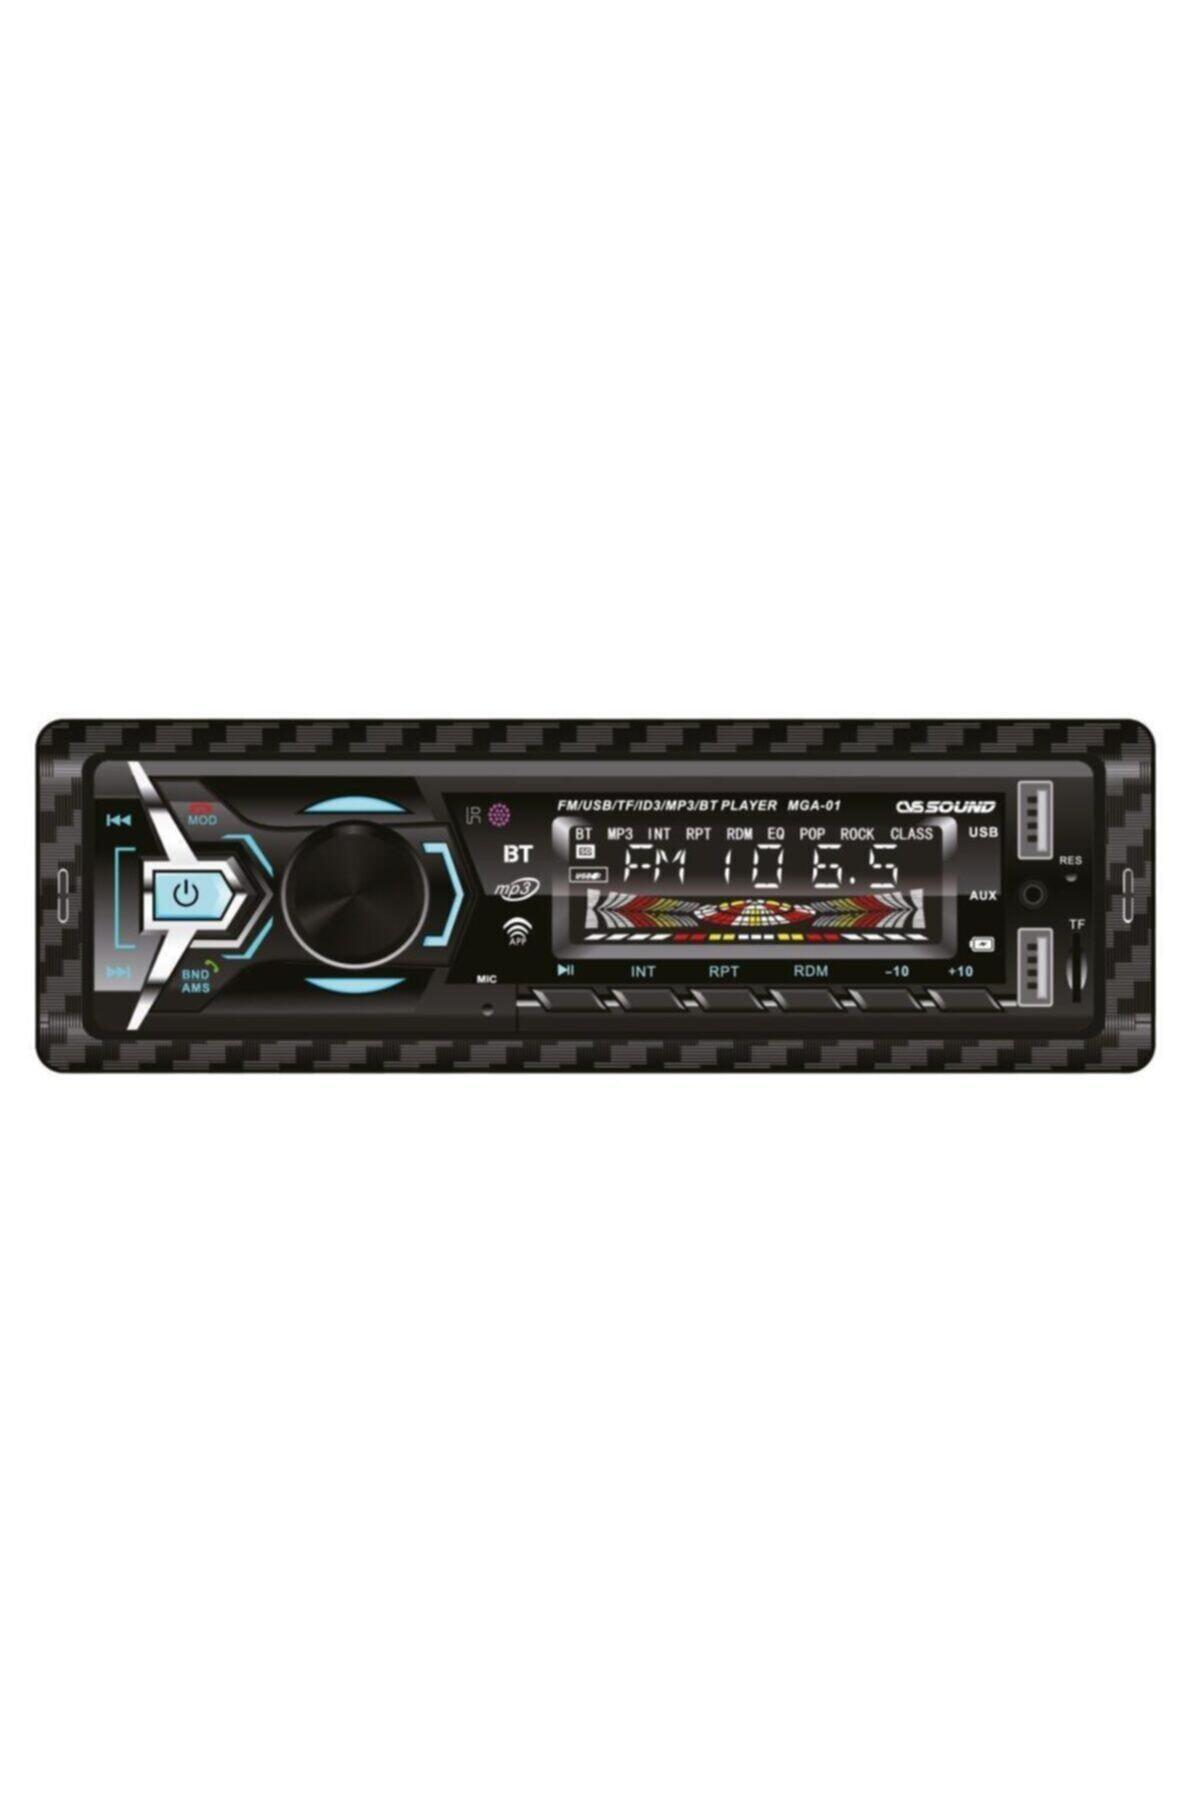 CVS Dn6302 Oto Teyp Radyo Bluetooth/aux/usb/sd Sevenkardeşler 1